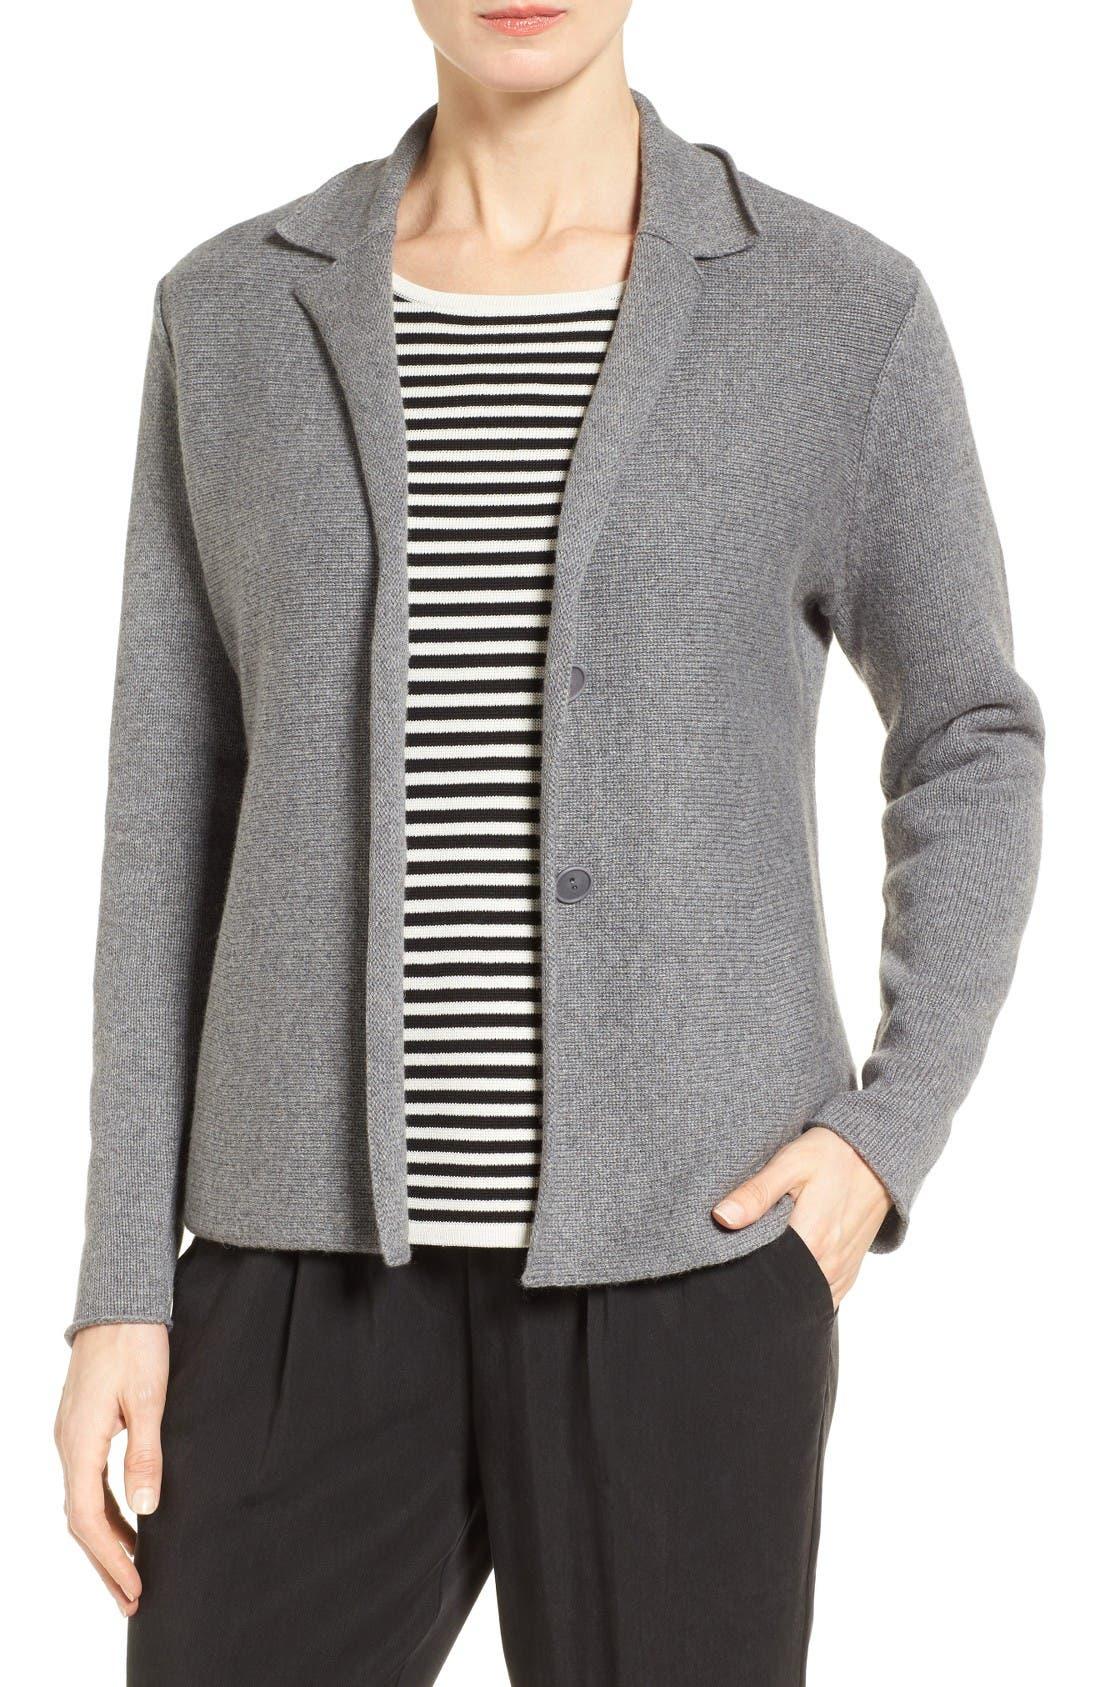 Main Image - Eileen Fisher Recycled Cashmere & Merino Wool Sweater Jacket